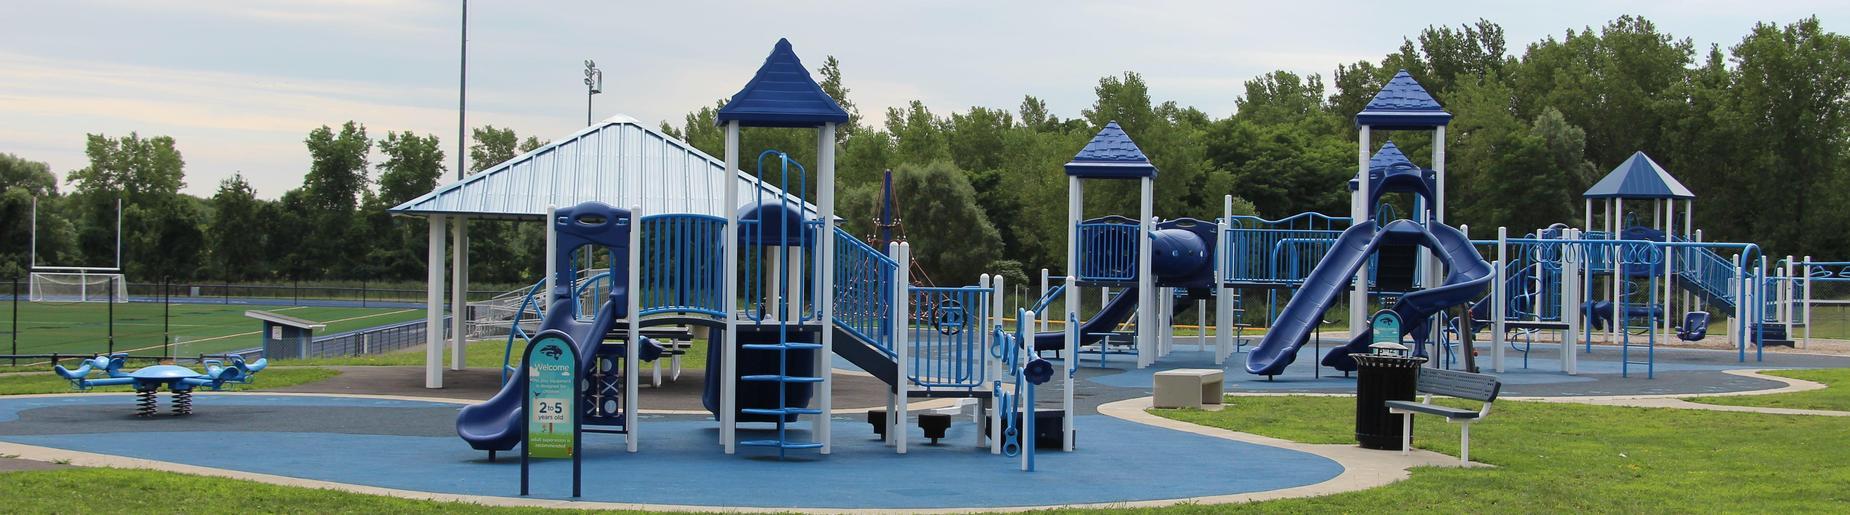 Richard Mann Elementary Playground 2019